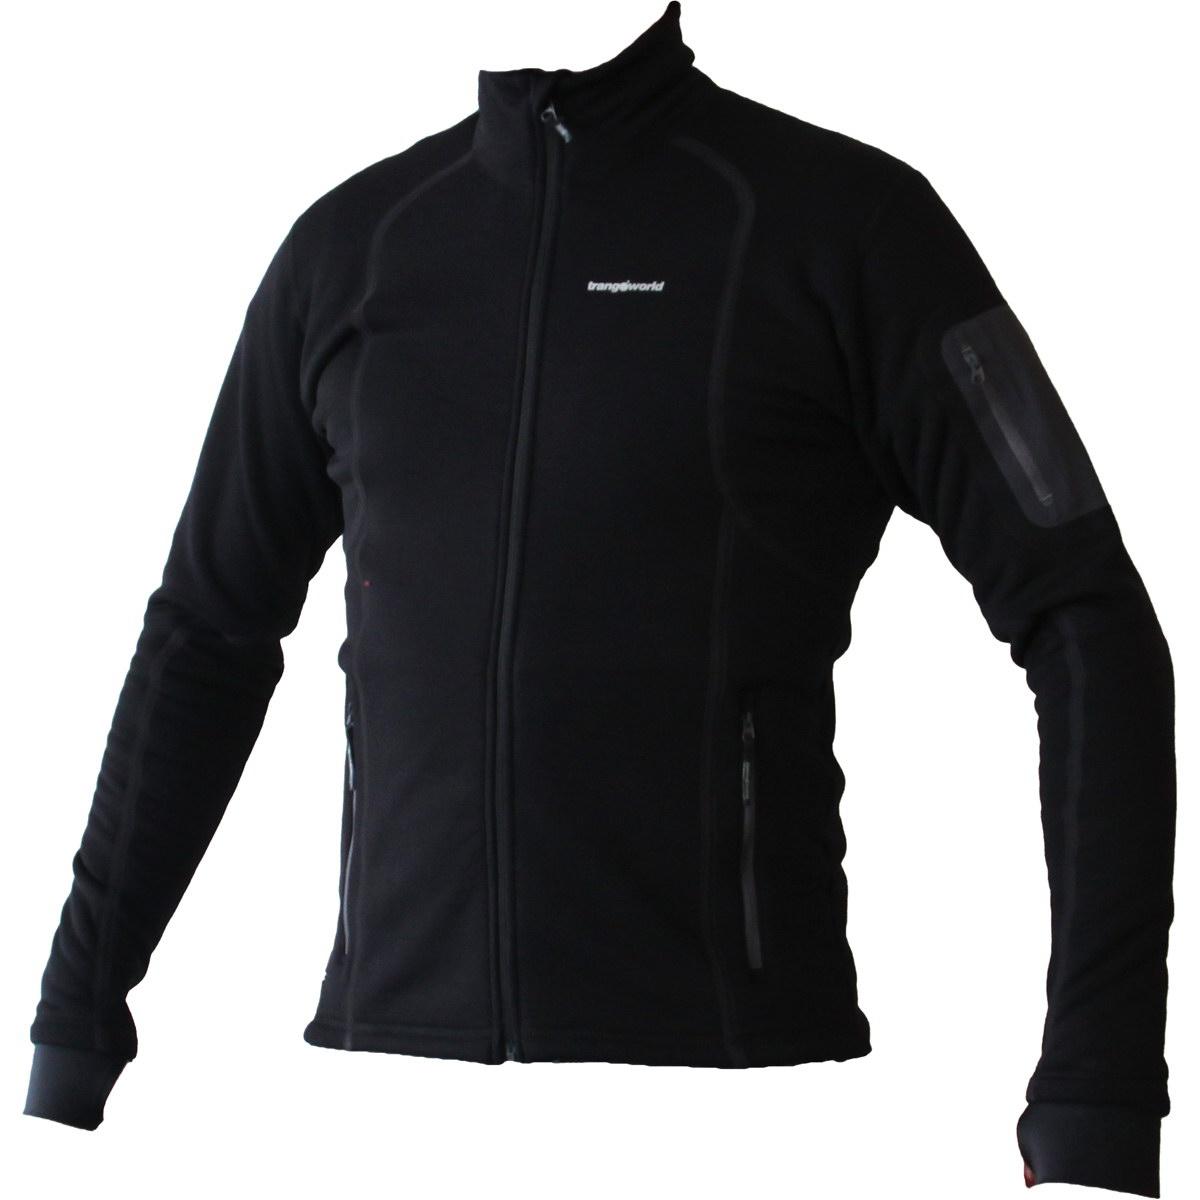 Trangoworld Angebote –  45 Prozent Rabatt auf Trangoworld Men's Lassok Jacket – Powerstretch Jacke